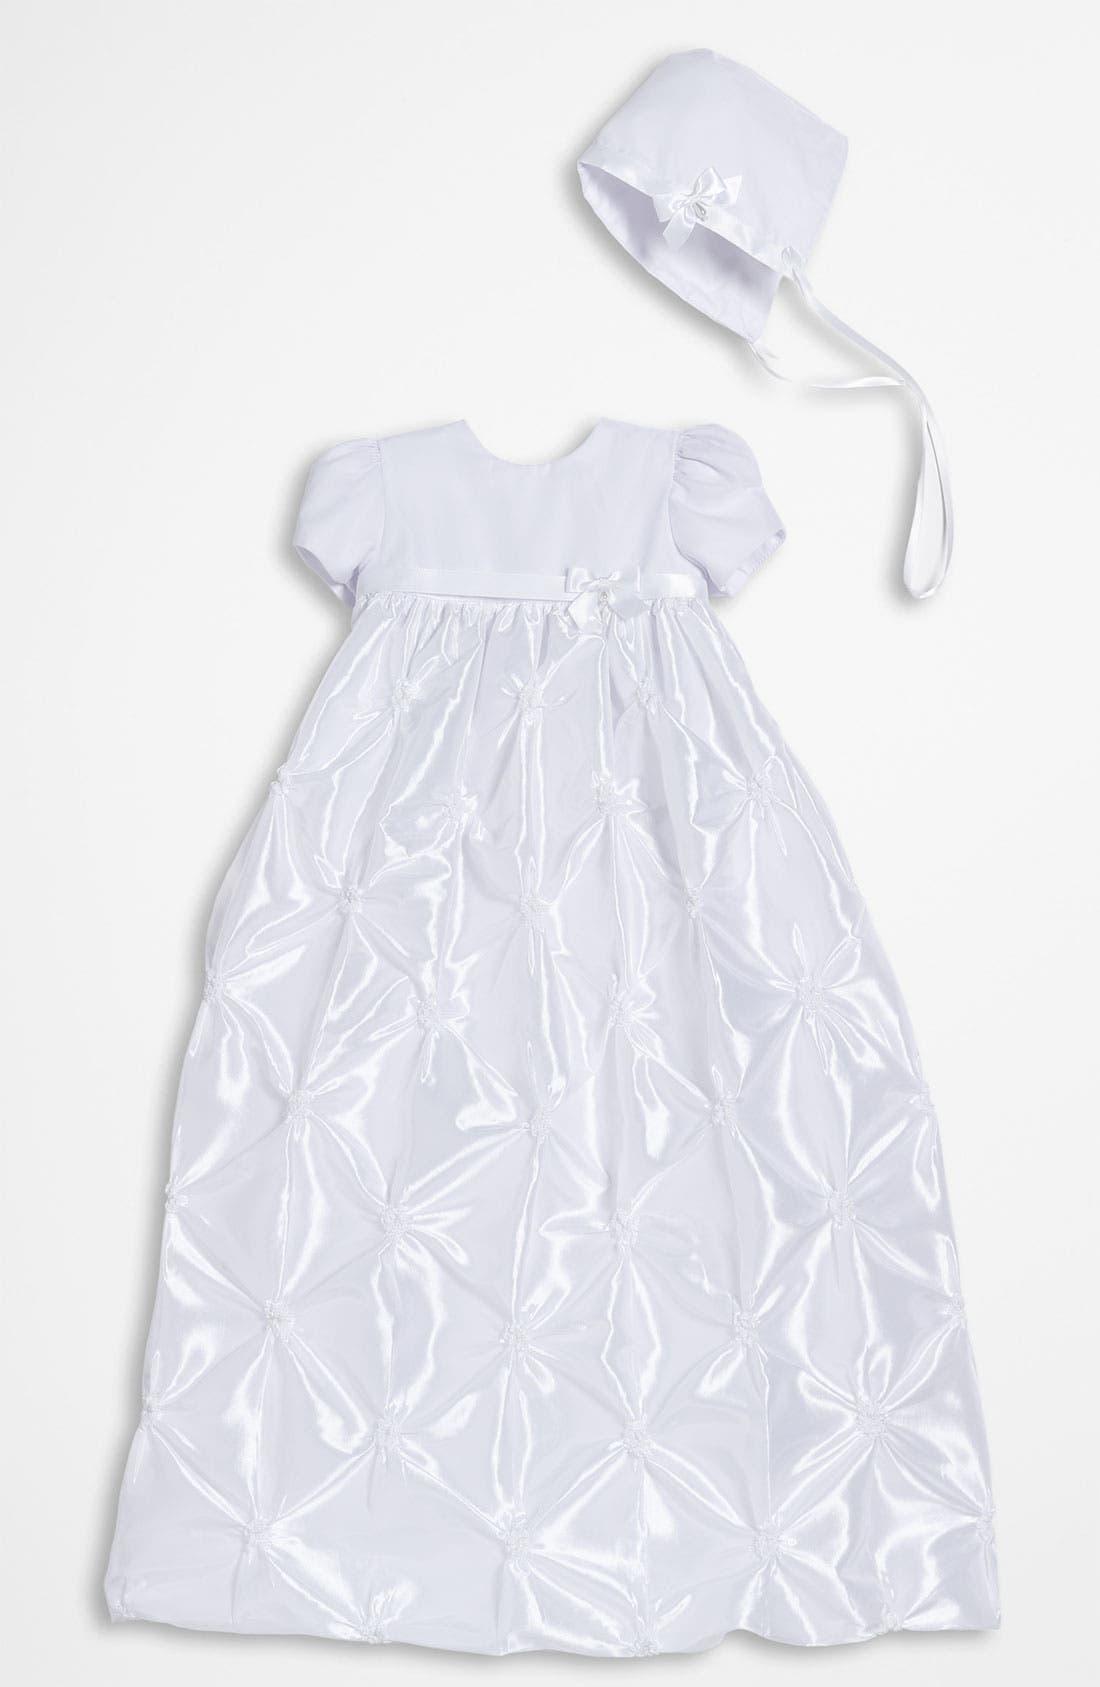 Main Image - Little Things Mean a Lot Taffeta Gown & Bonnet (Baby)